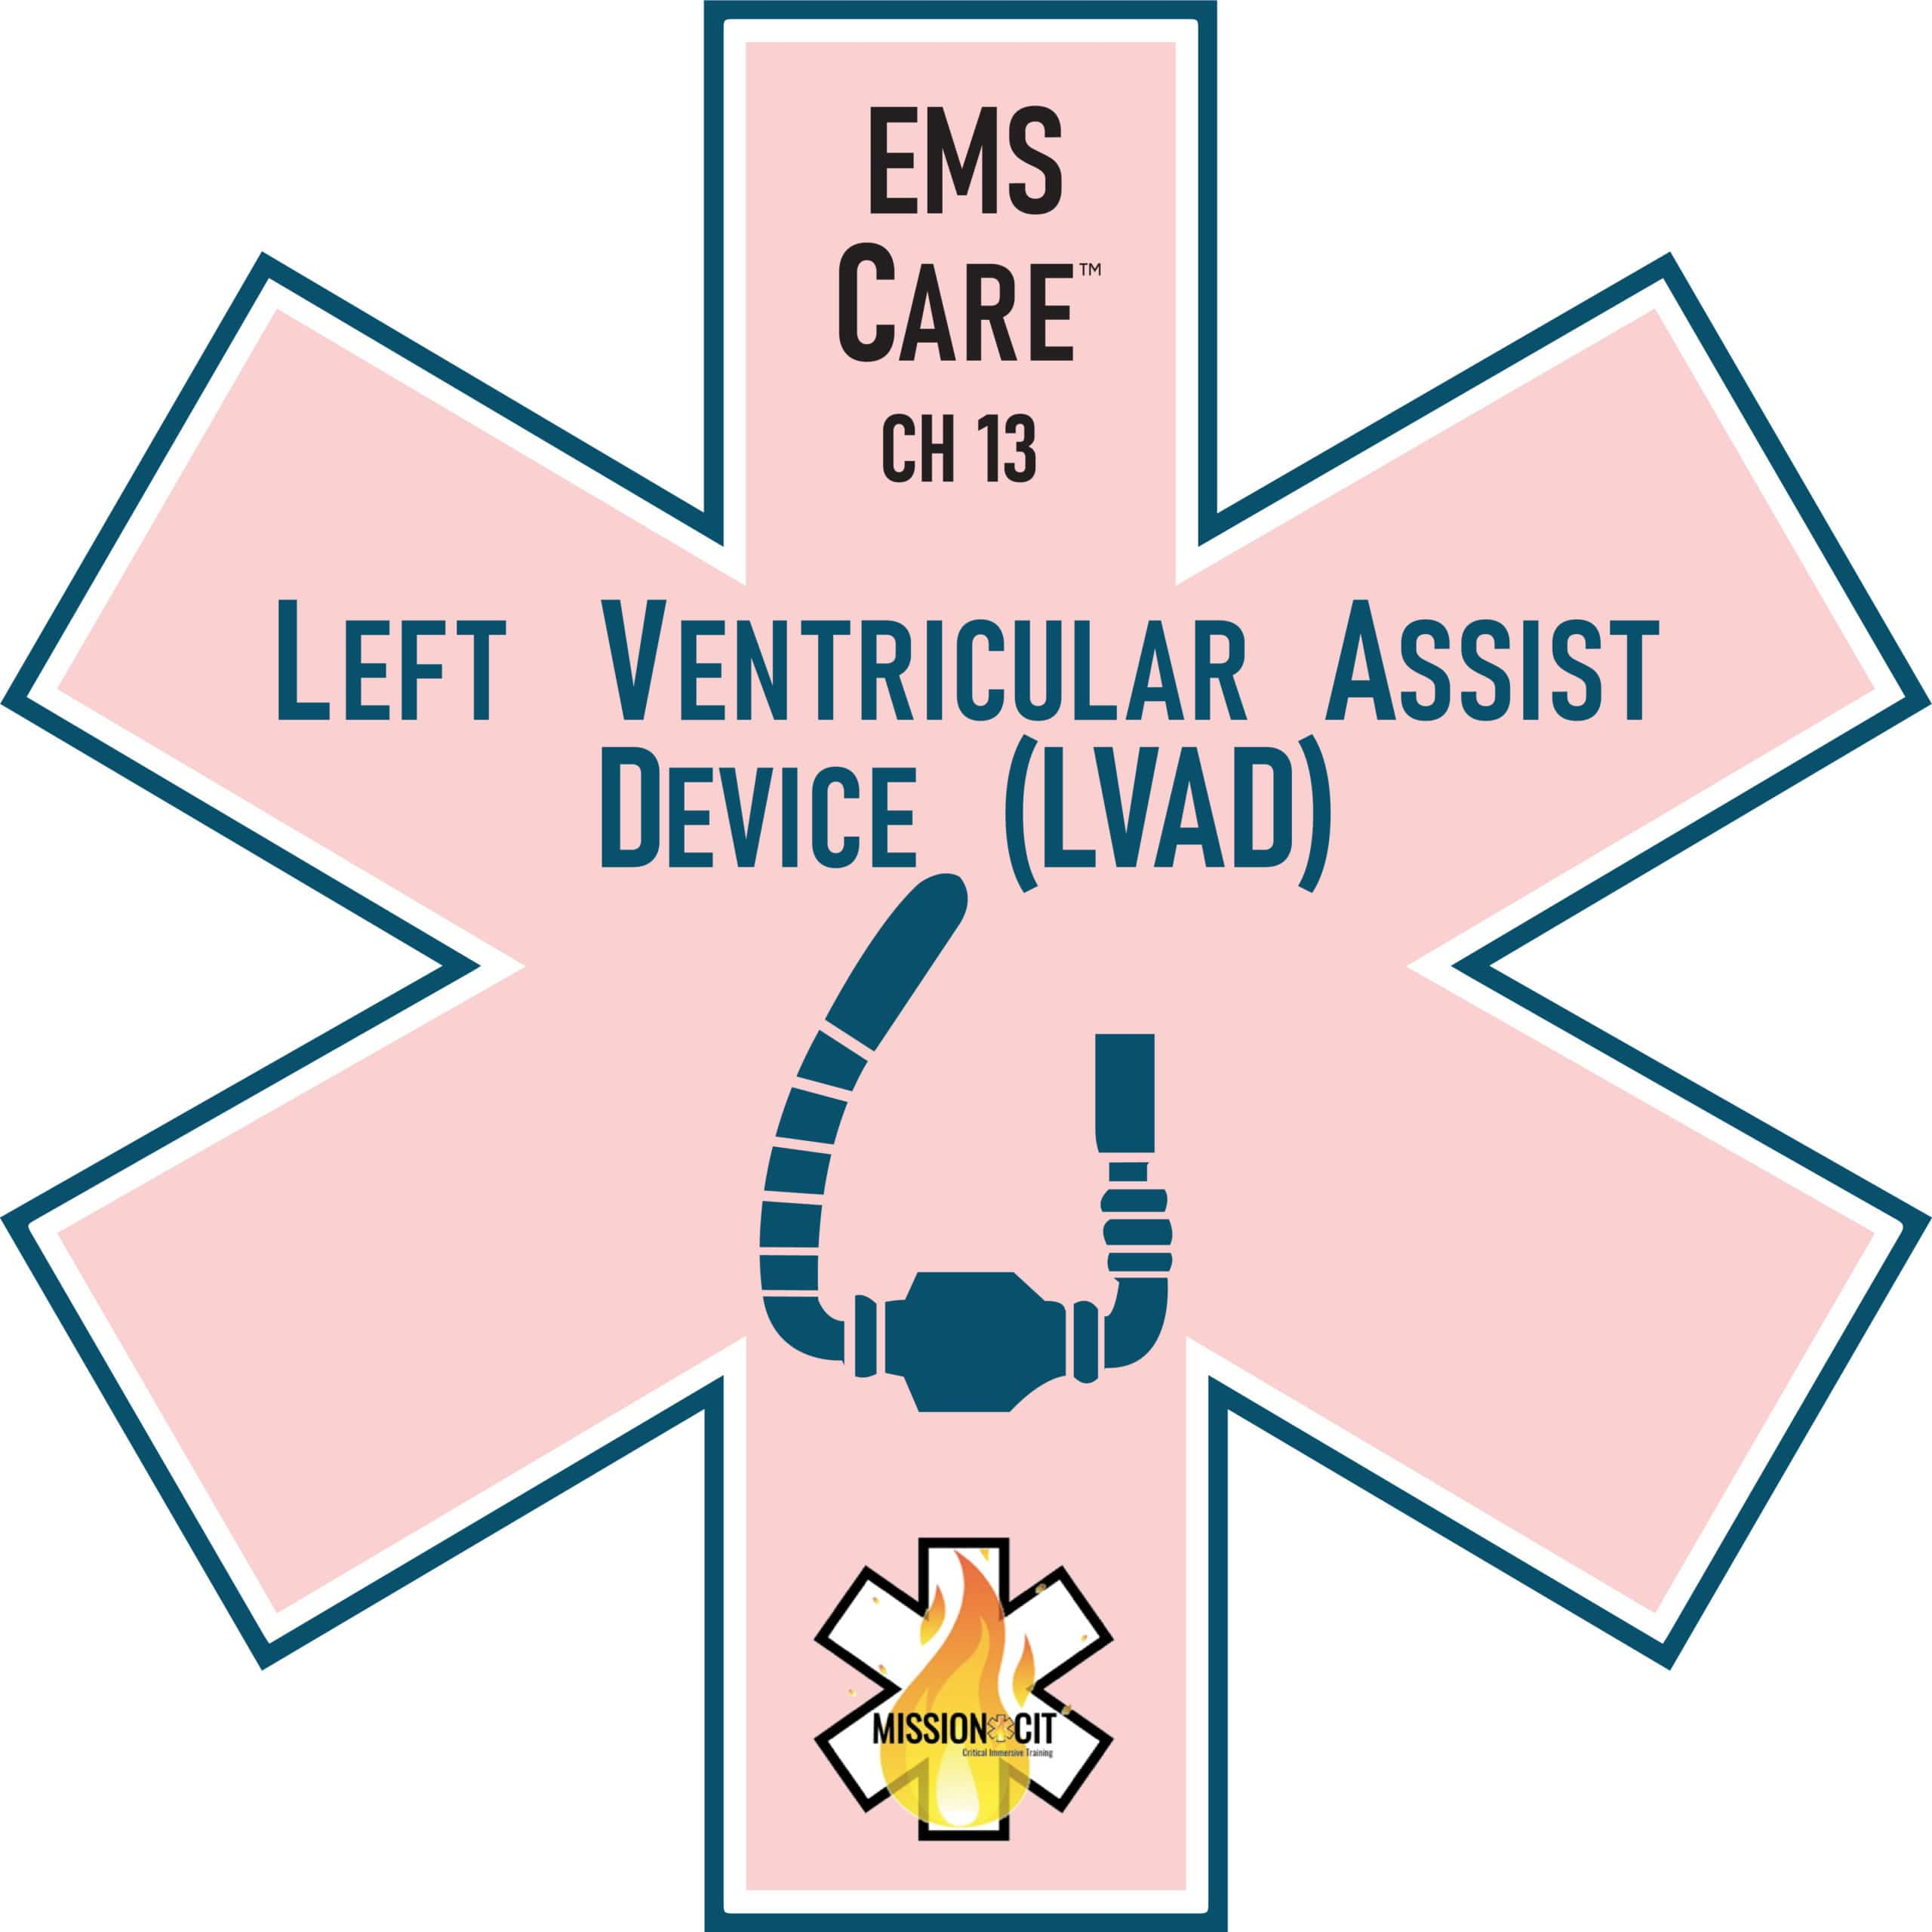 Left Ventricular Assist Device (LVAD) | LVAD Patient | LVAD Training | Ventricular assist device types | lvad complications